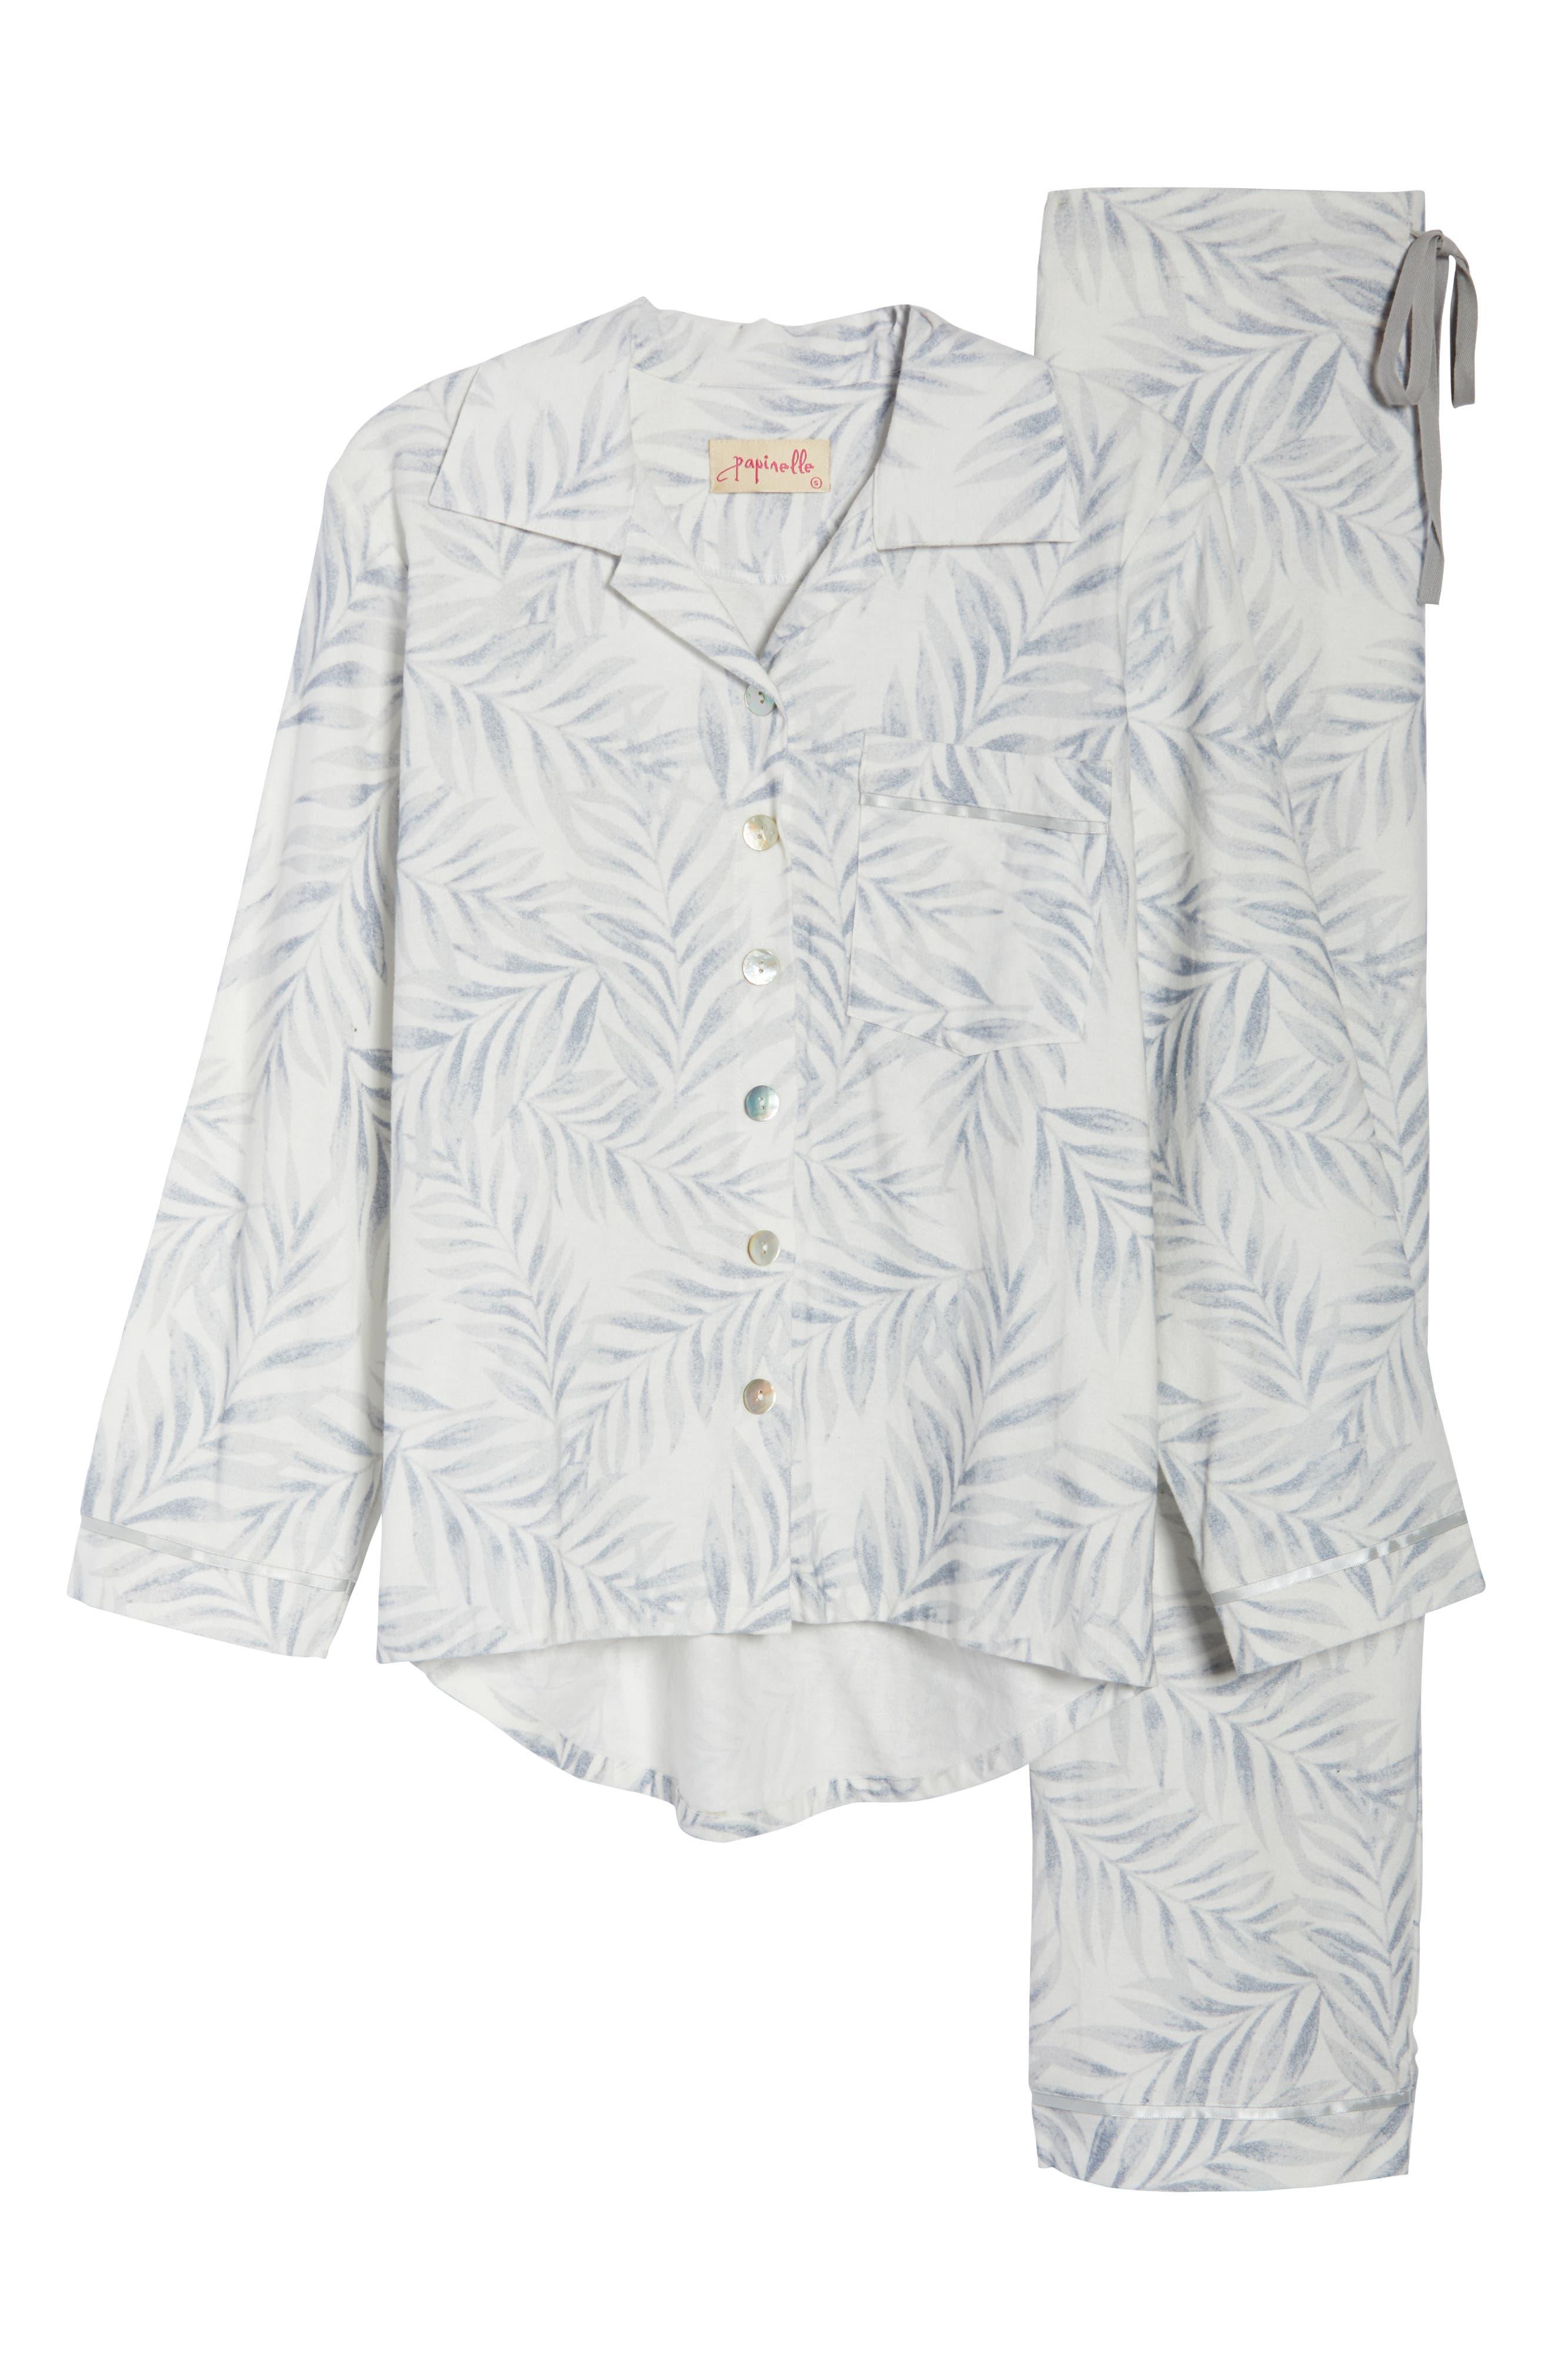 Silver Palms Pajamas,                             Alternate thumbnail 6, color,                             GREY